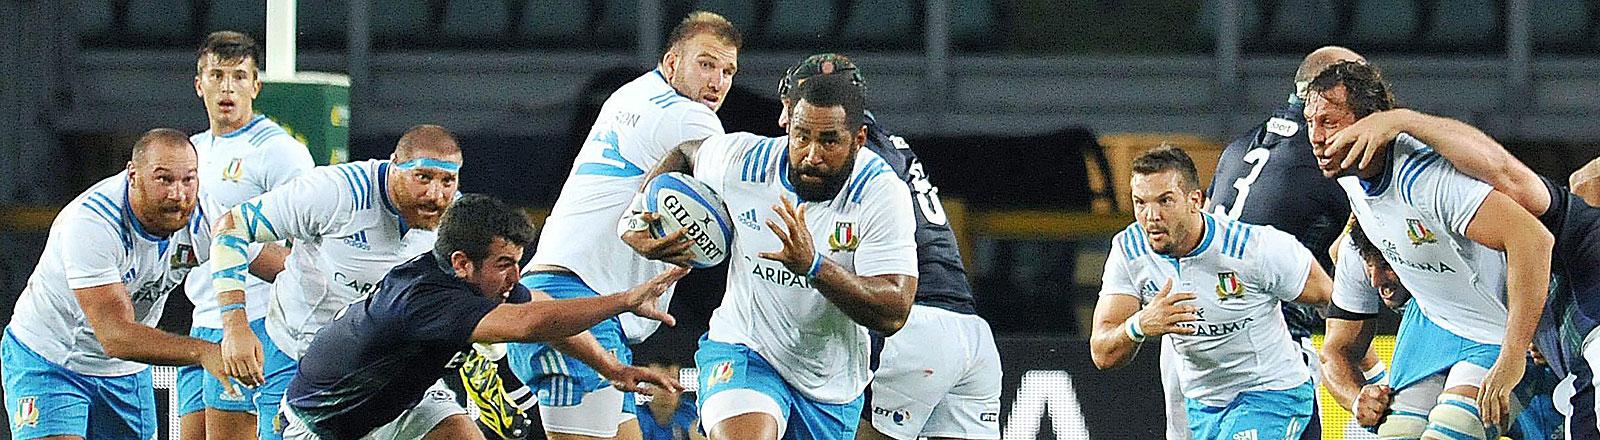 Rugby Spiel Italien vs.Scotland am 23.8.2015